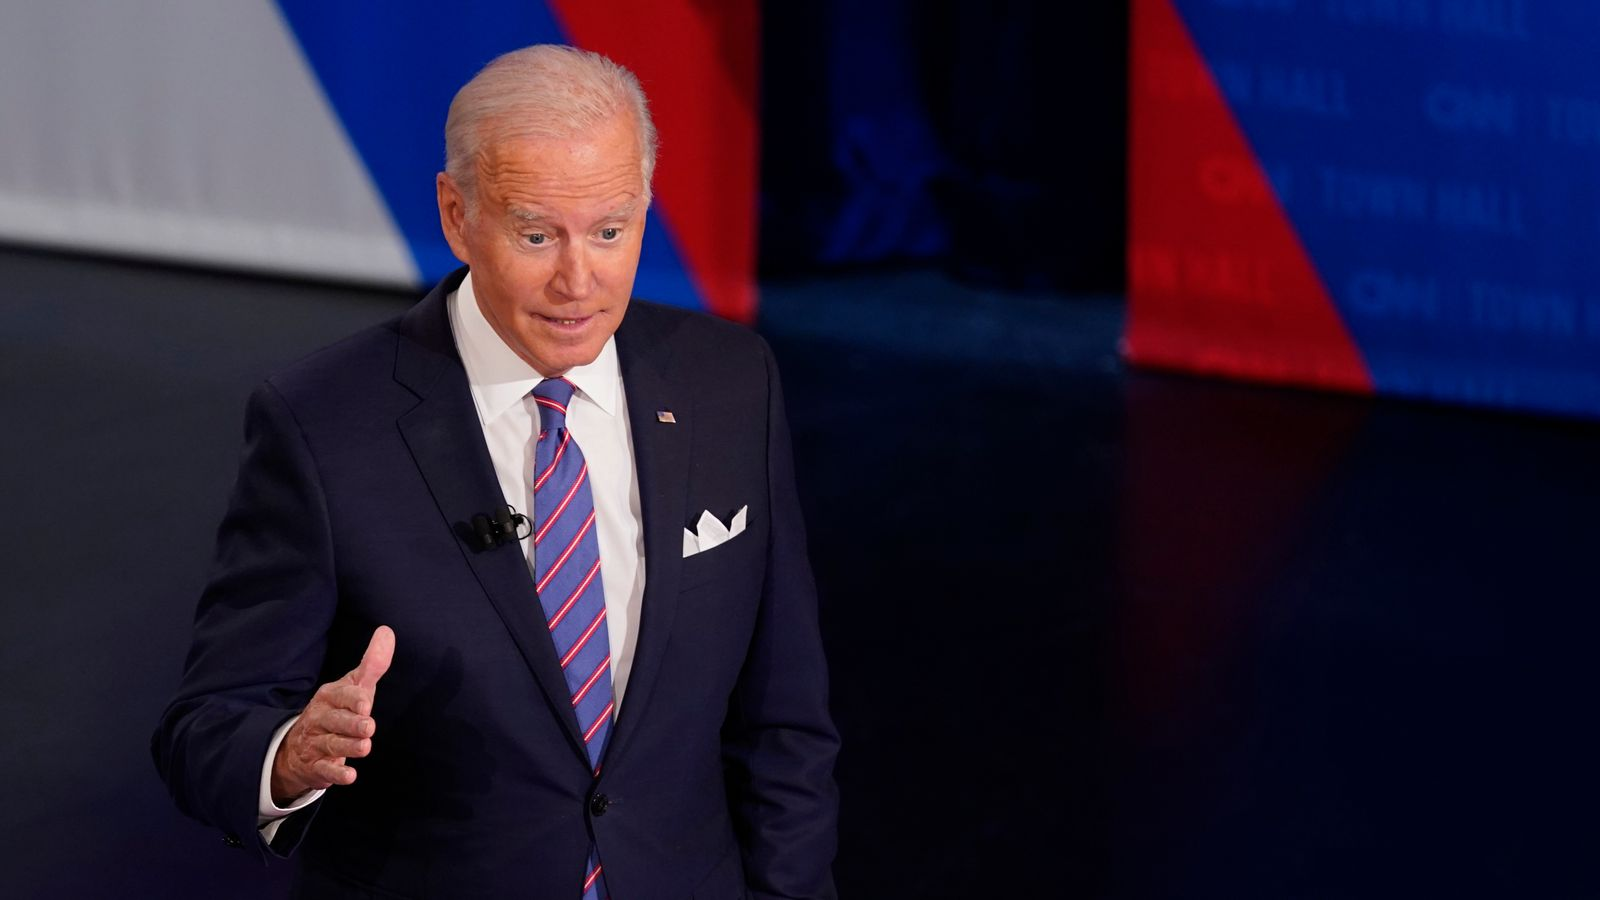 US President Joe Biden says America will defend Taiwan if China attacks